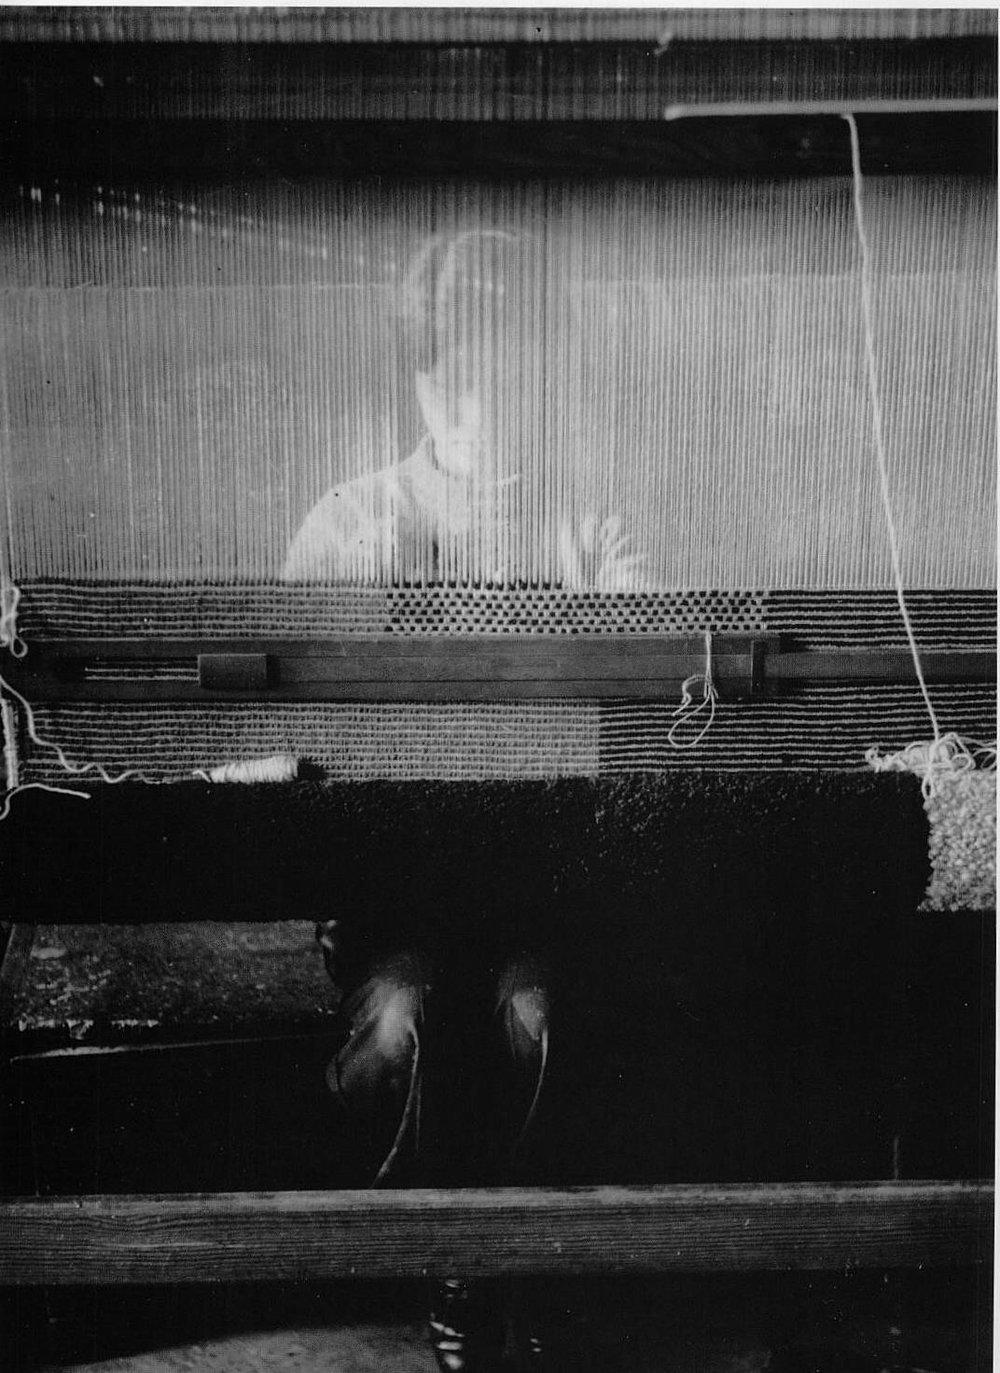 oysteros :     Bauhaus -  Tejedora Tras La Urdimbre